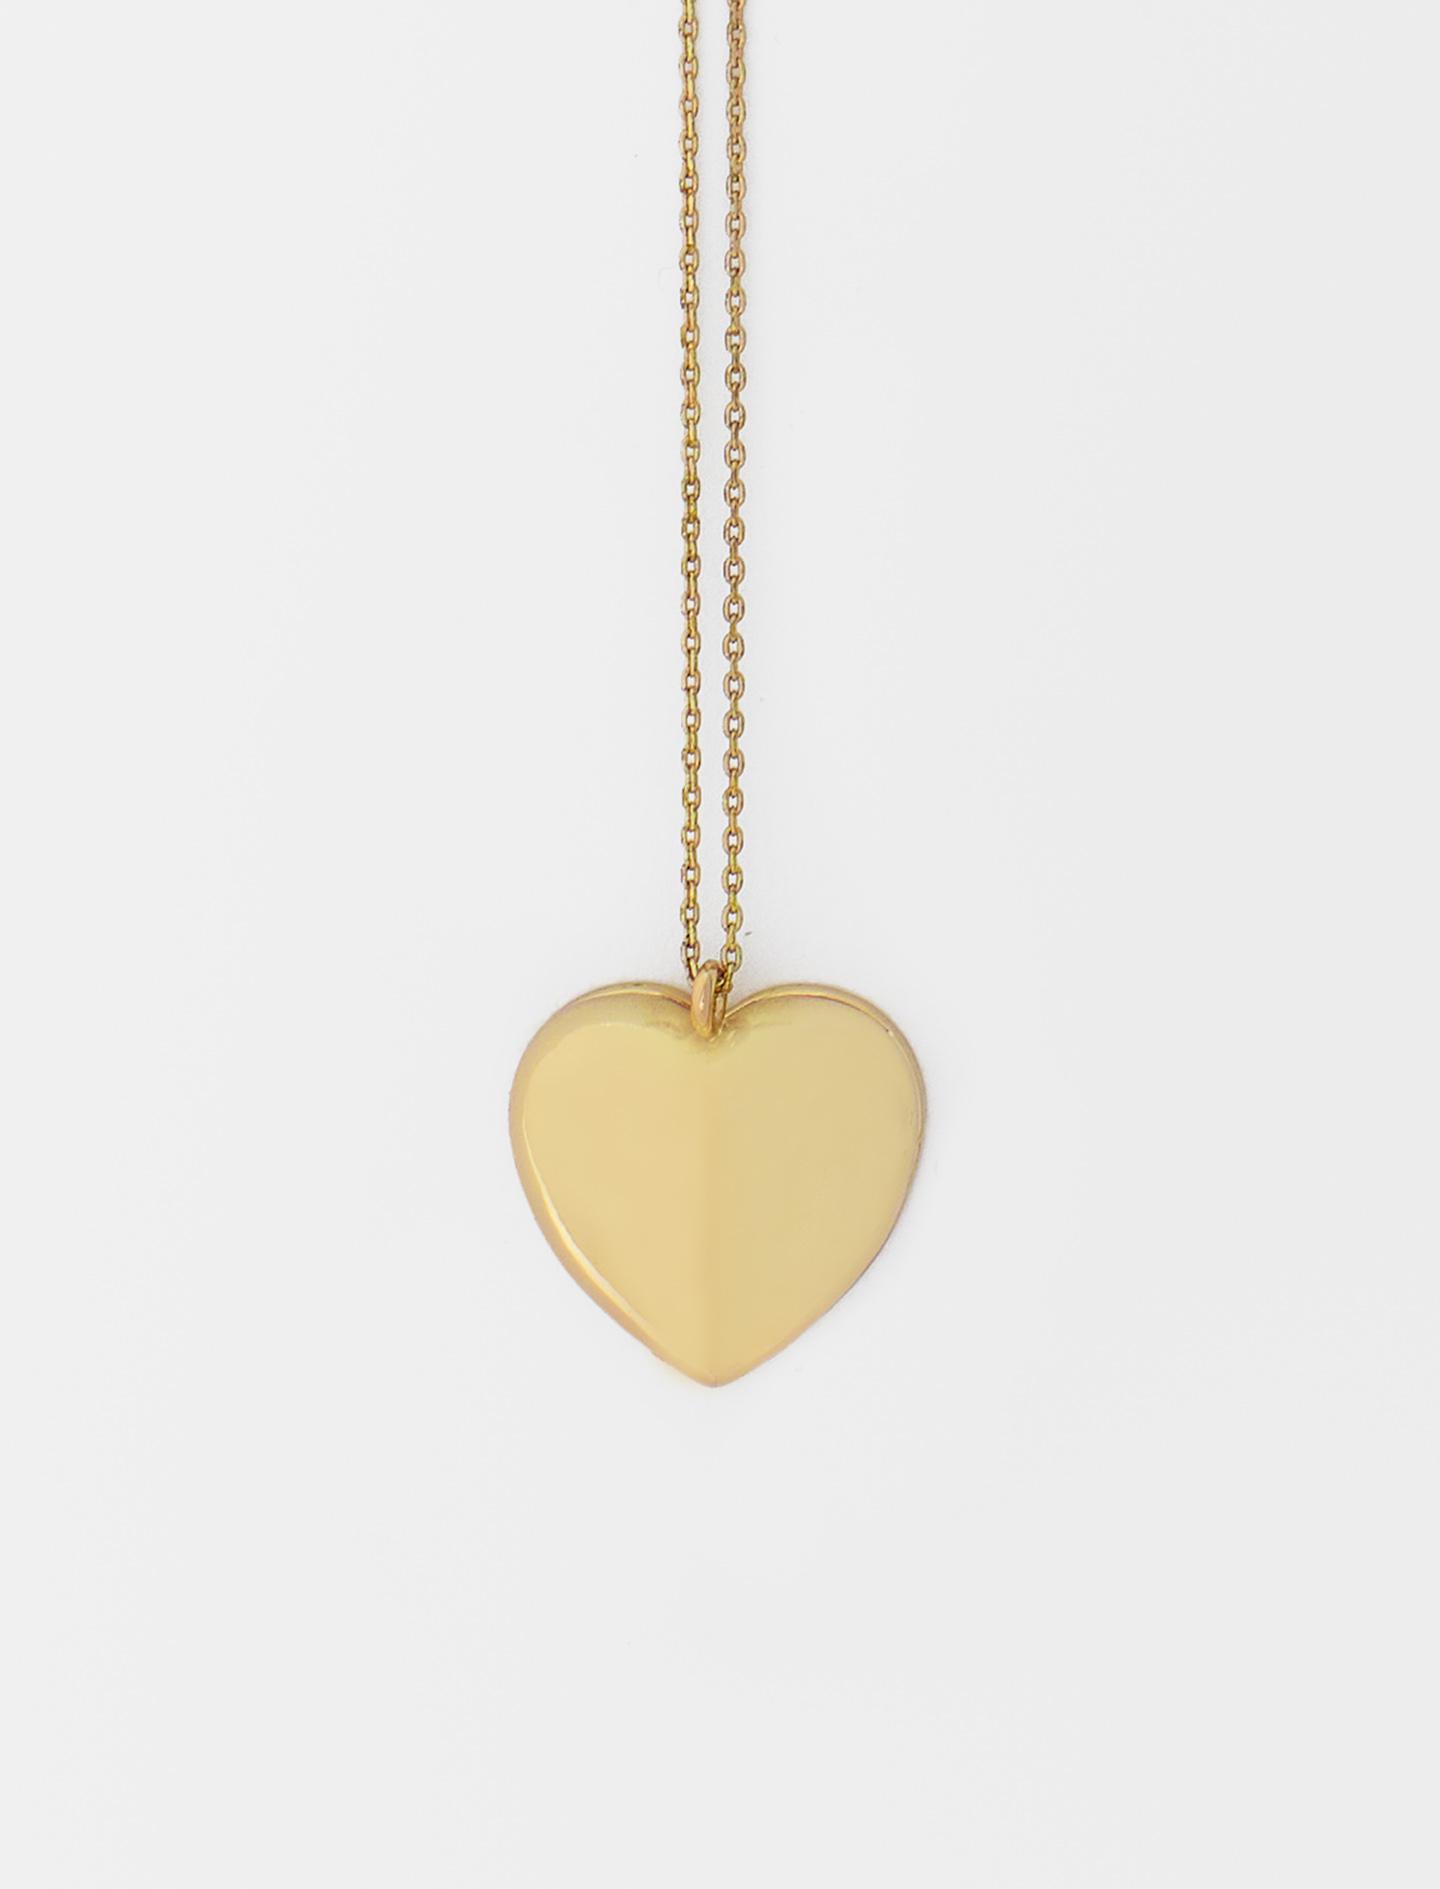 Gold-tone heart photo locket necklace - Gold